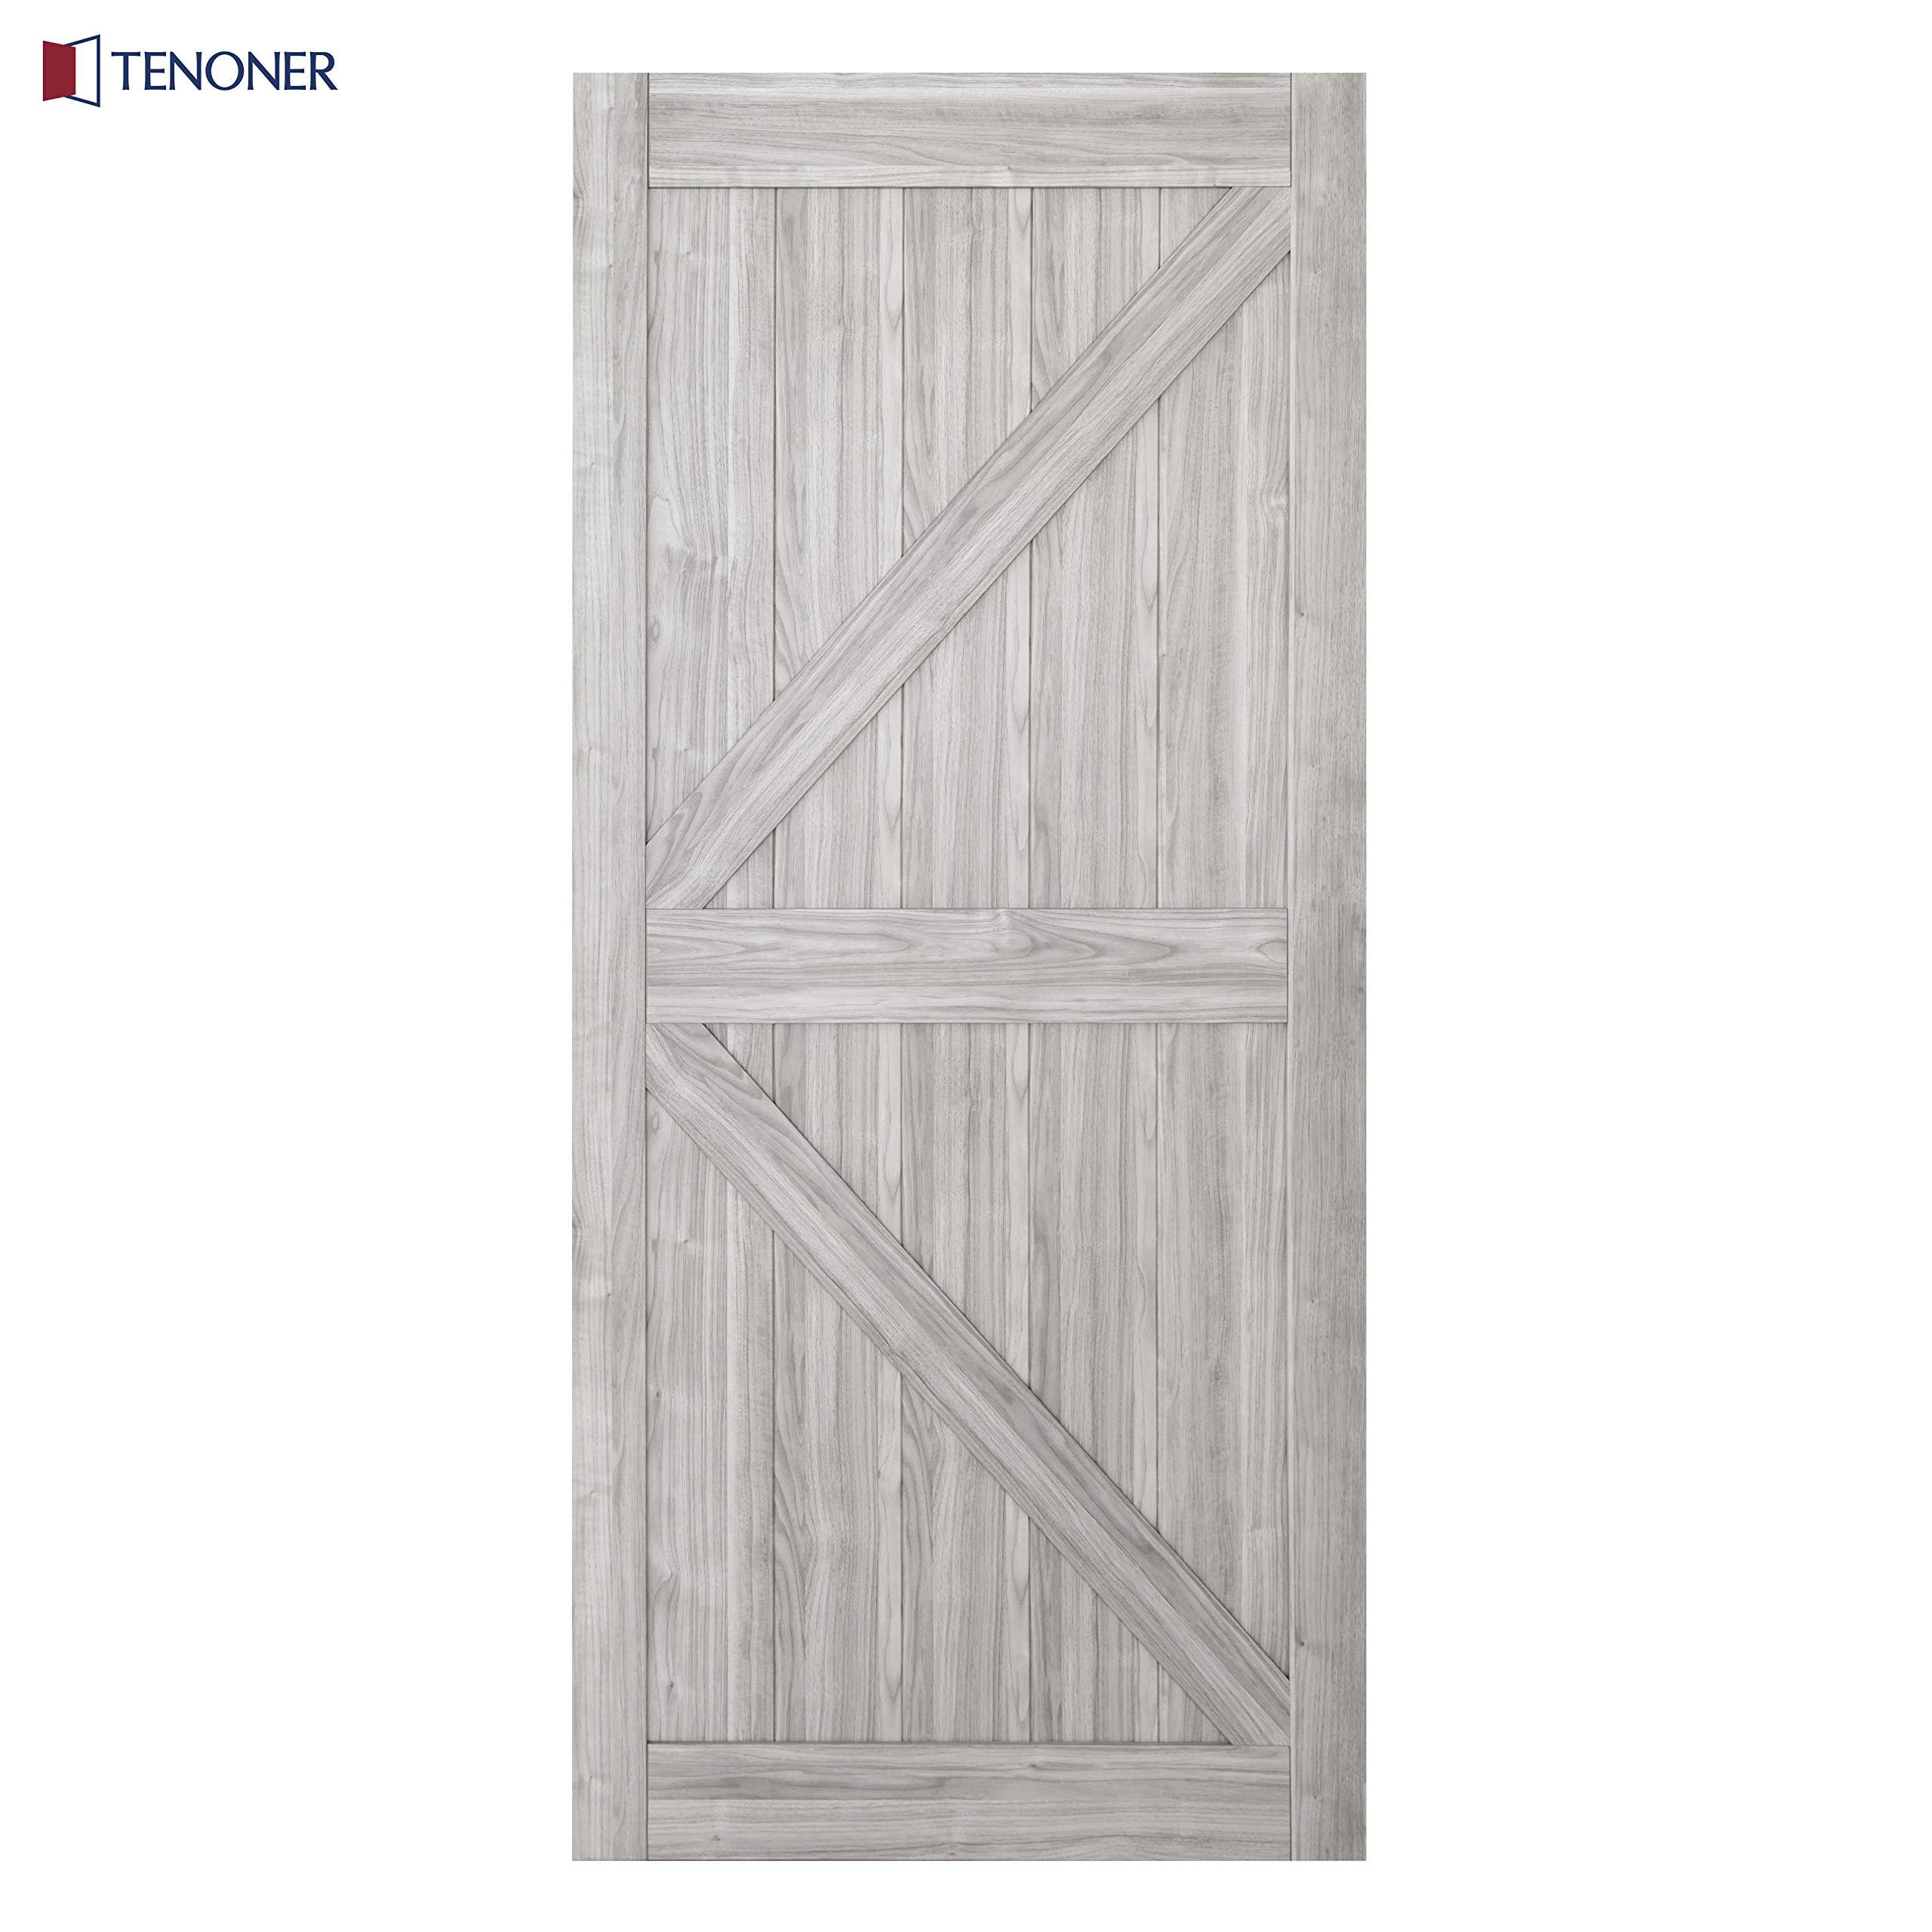 TENONER 36in x 84in Grey K-Frame Sliding Barn Door, 6.6ft Barn Door Hardware Kit & Handle Included by TENONER (Image #3)